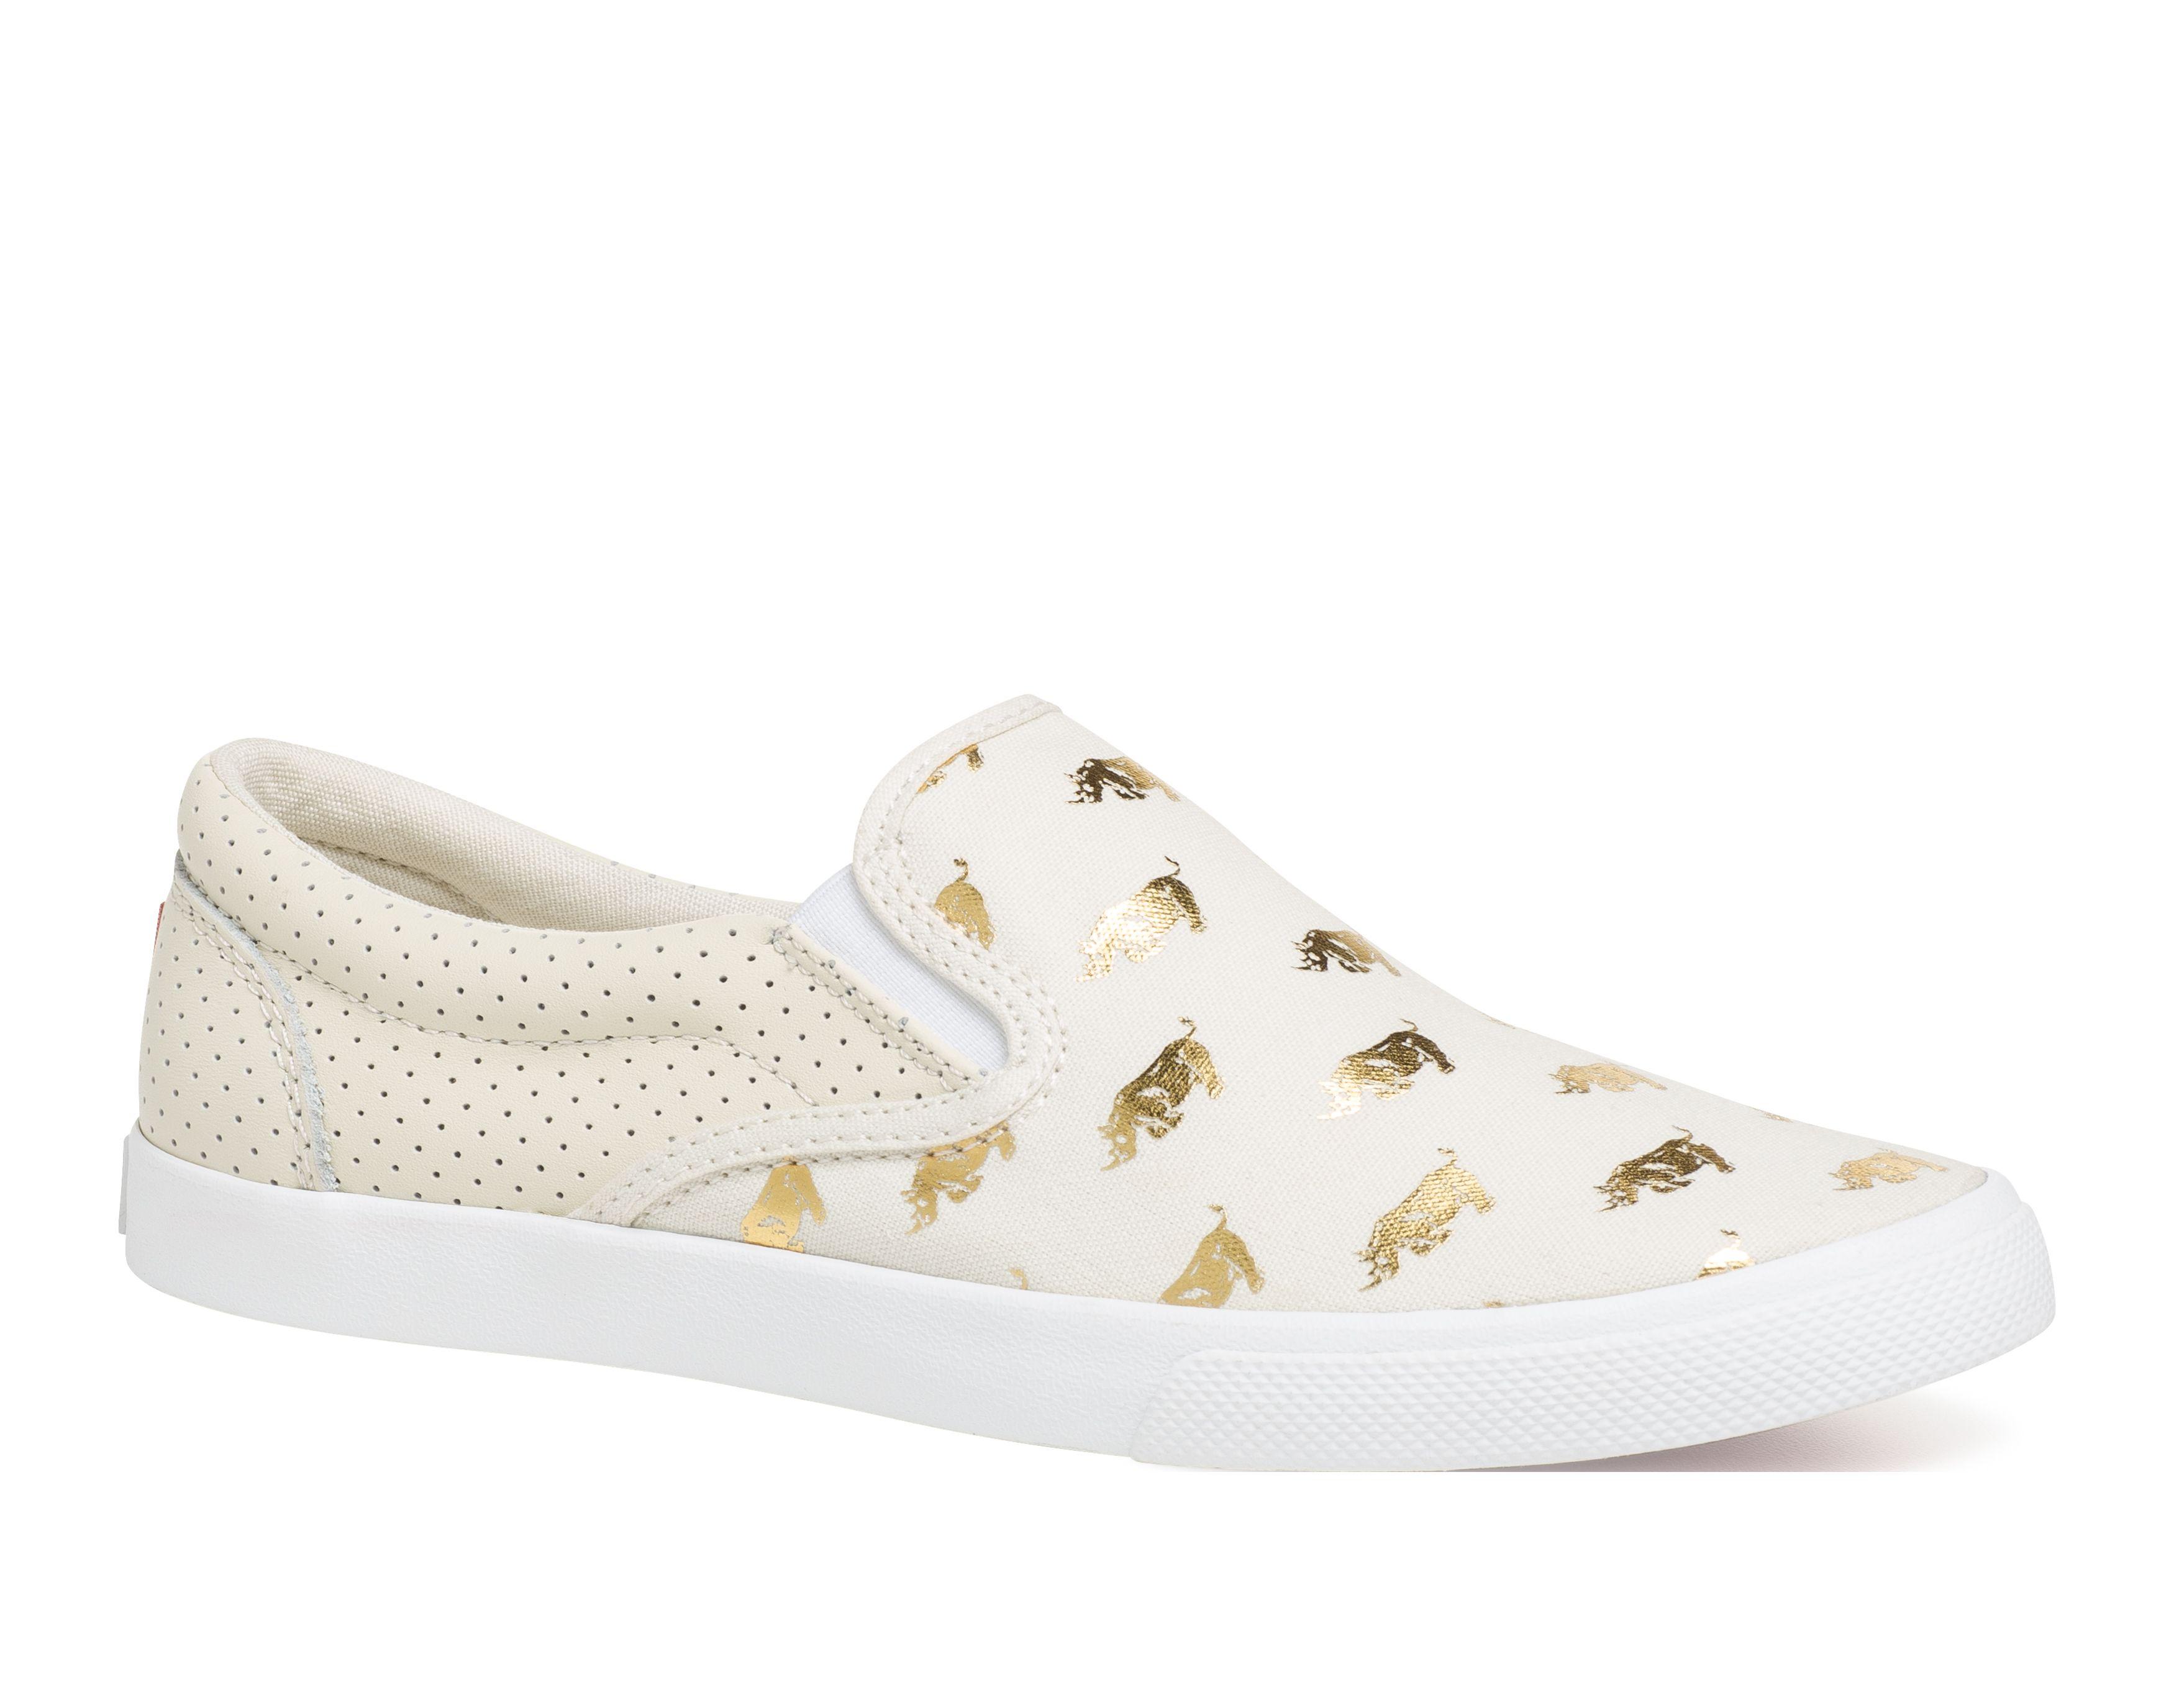 adidas gazelle wit dames sale